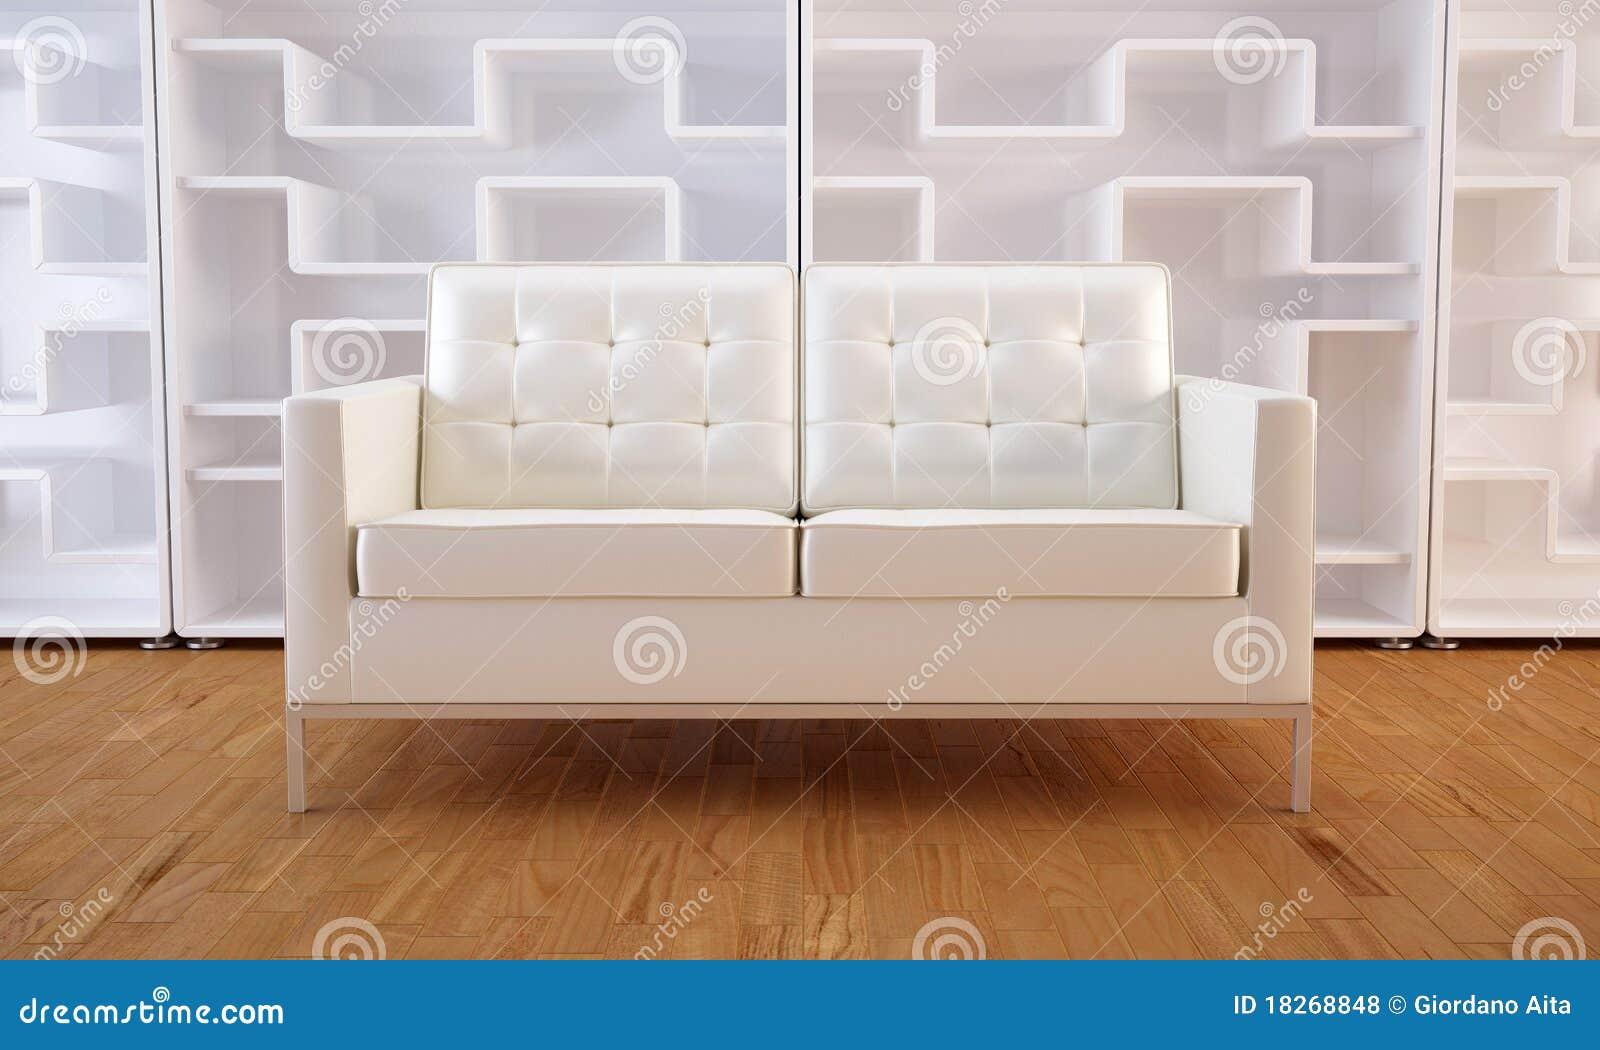 gallery of witte boekenkast gamma boekenkast gamma slaapkamer in kast interieur inrichting with boomstam plank gamma with hoekbank gamma